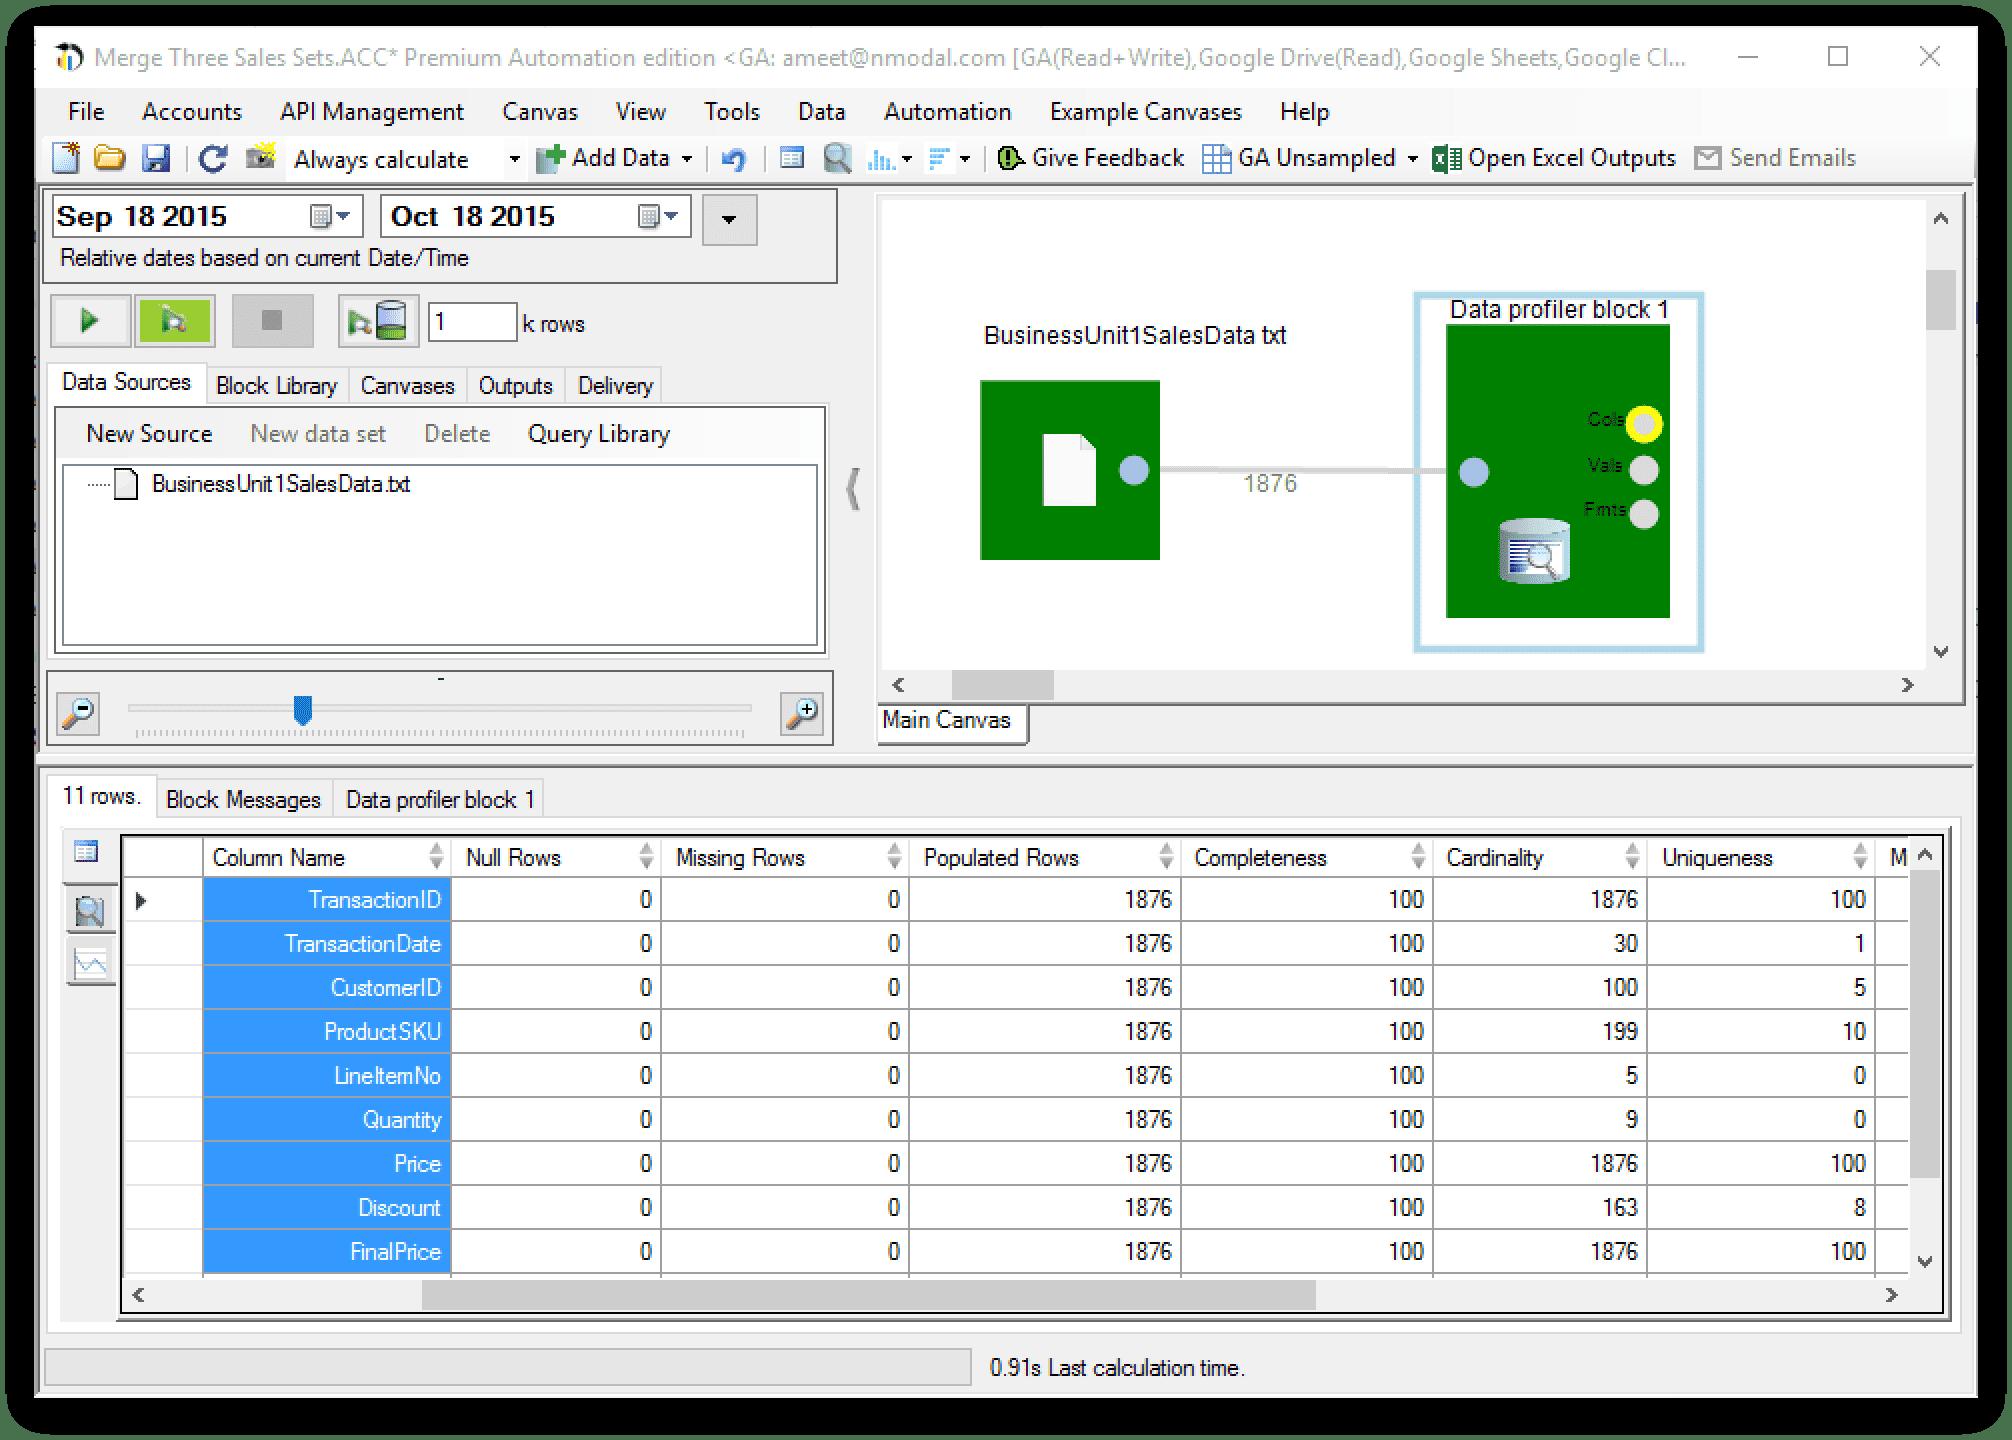 data profiler block - analytics canvas